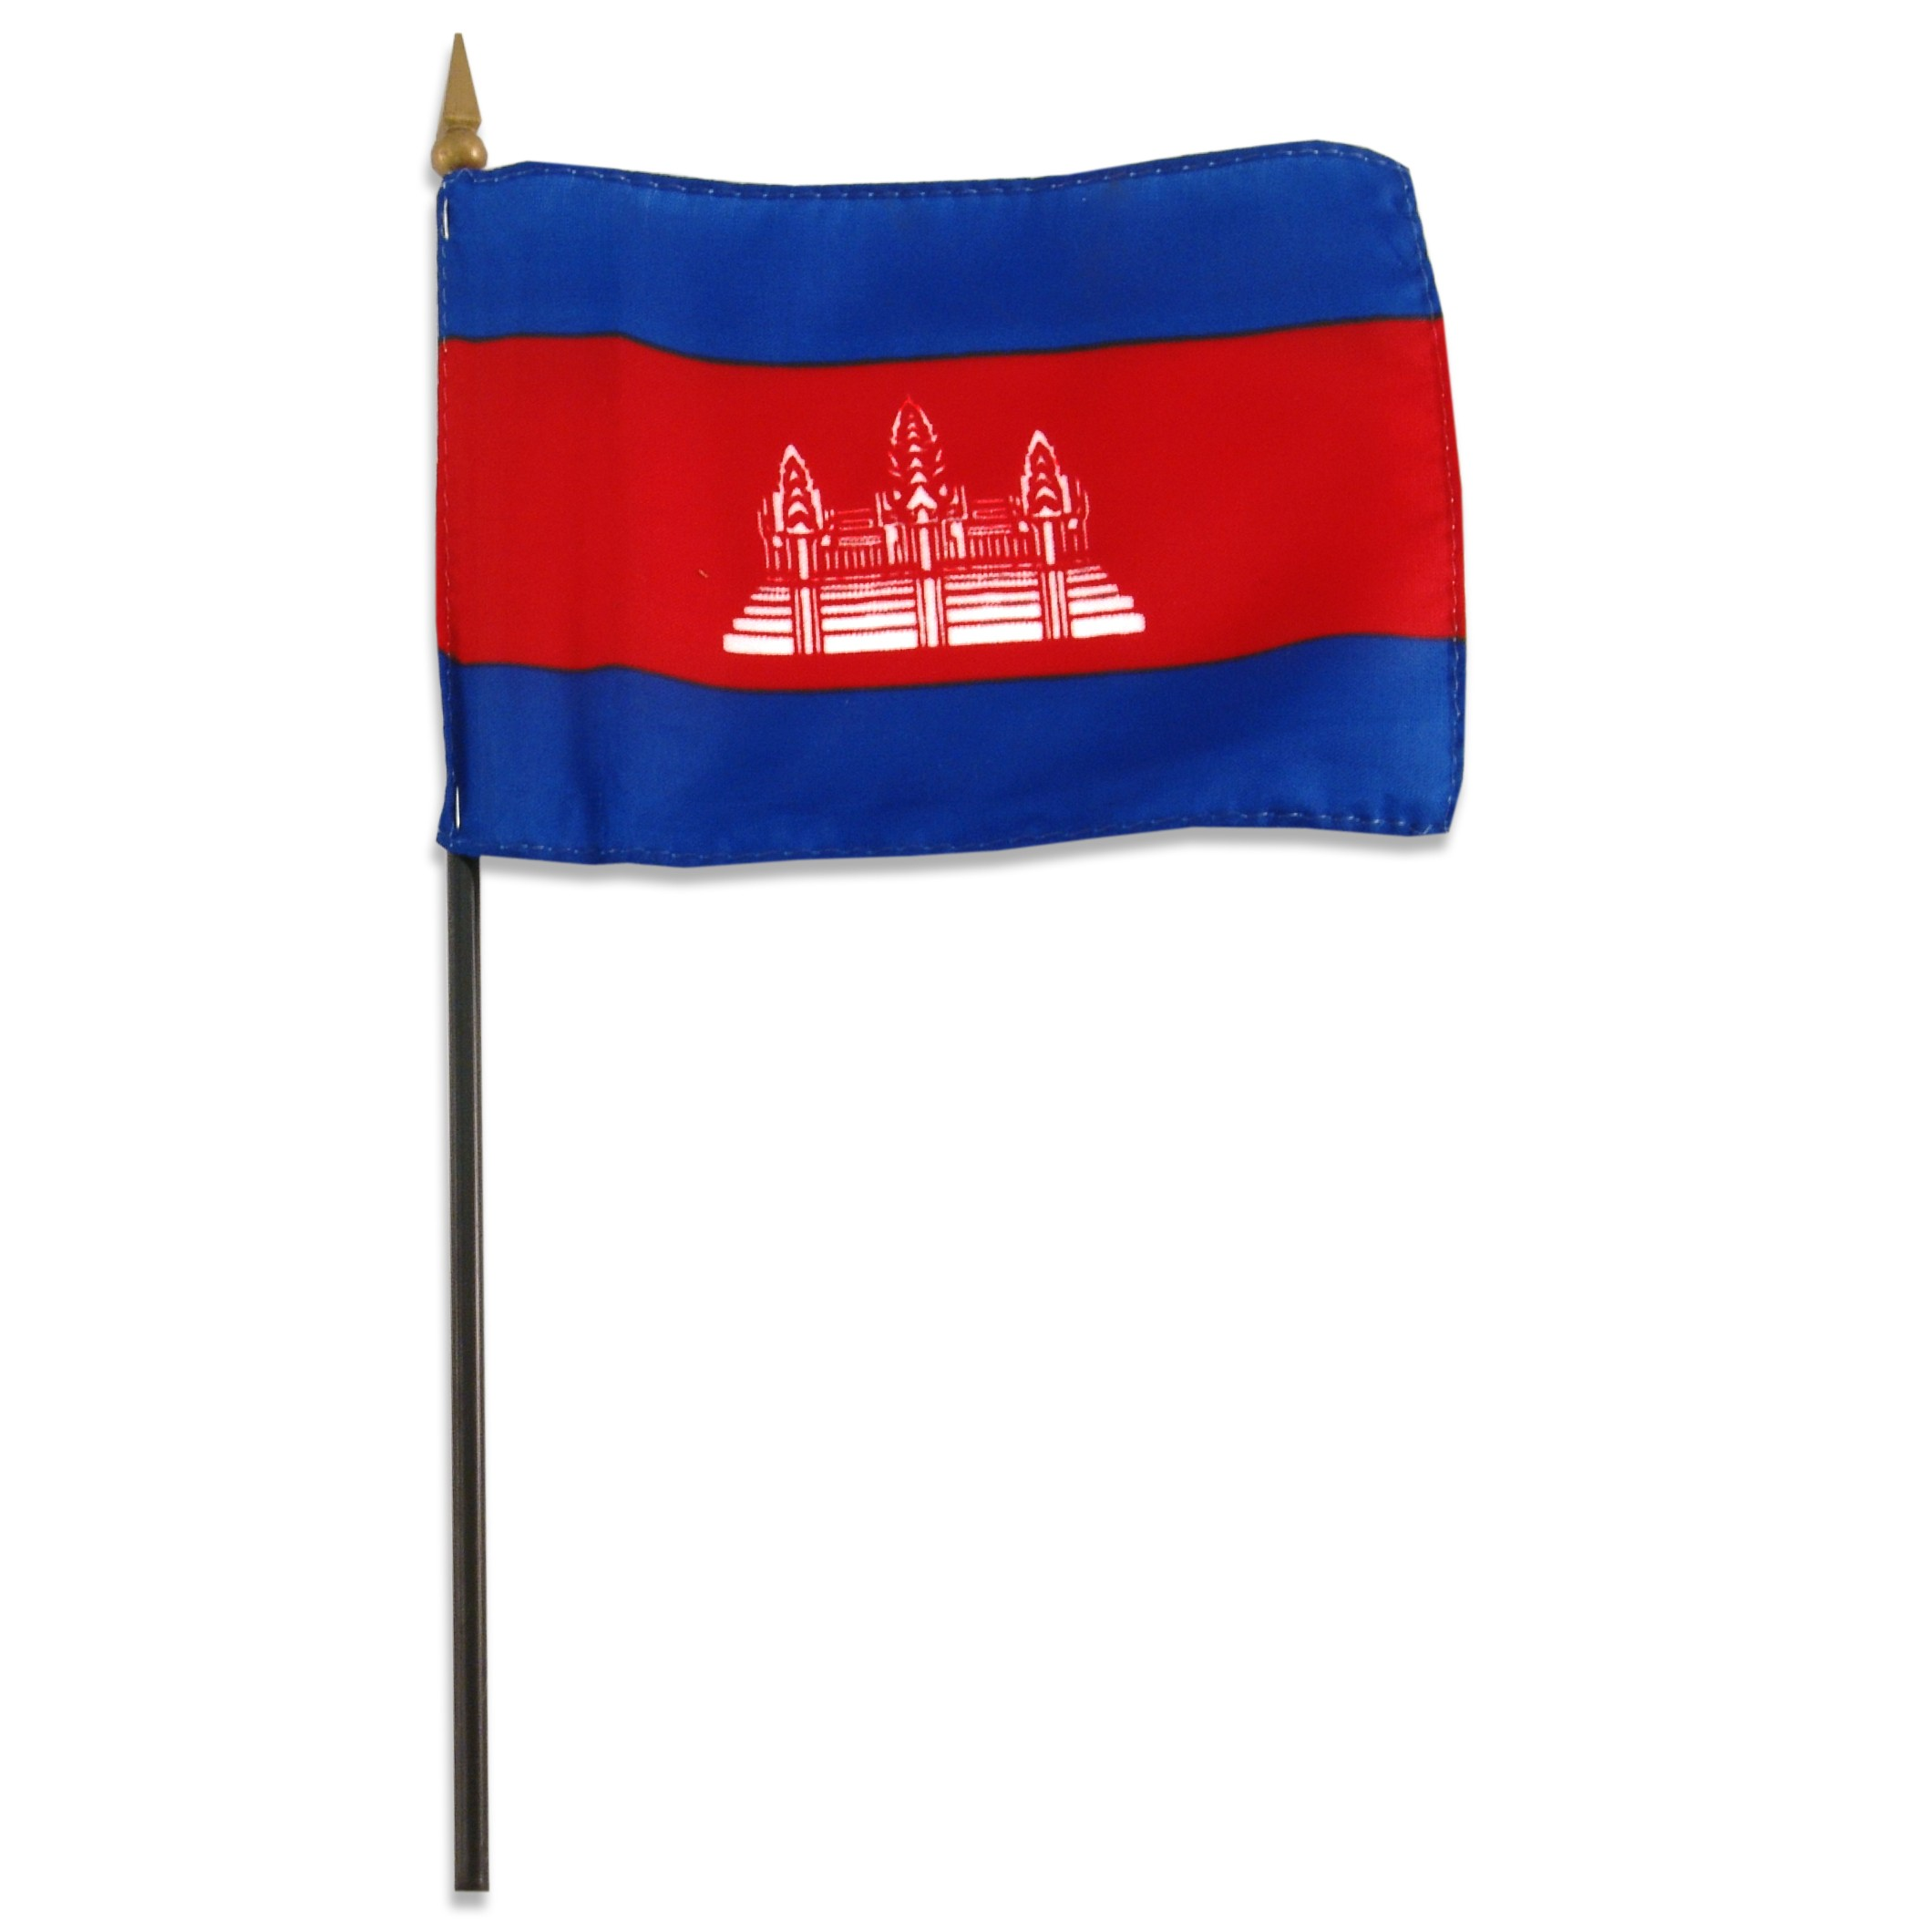 Cambodia flag 4 x 6 inch.